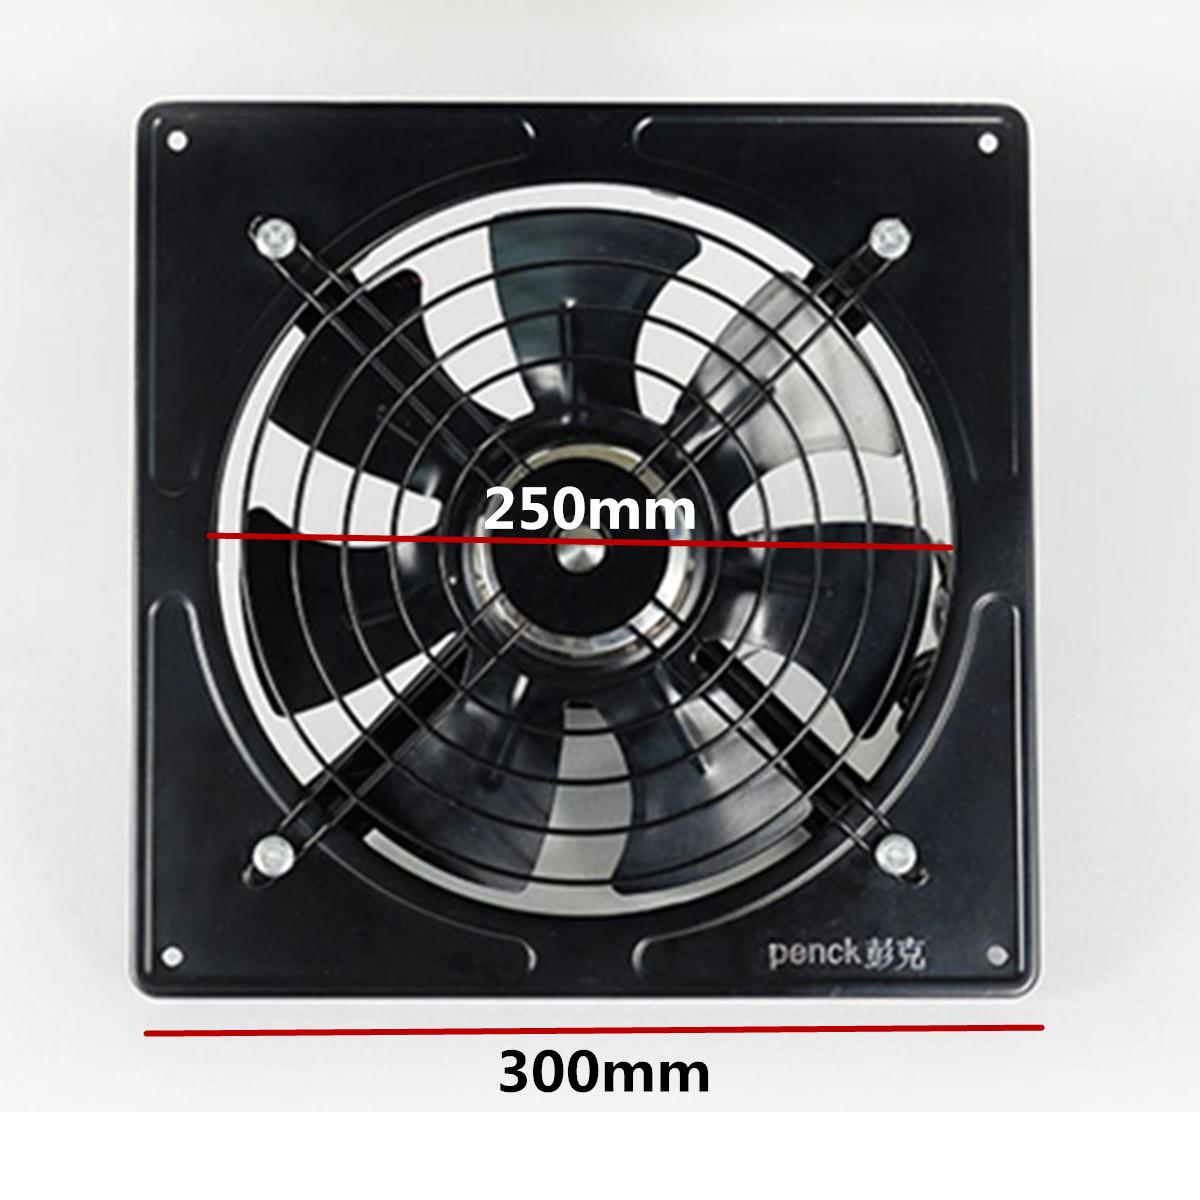 Industrie-Großraum-Ventilator-Lüfter Abluft Abzug Wand Gebläse Metallventilator